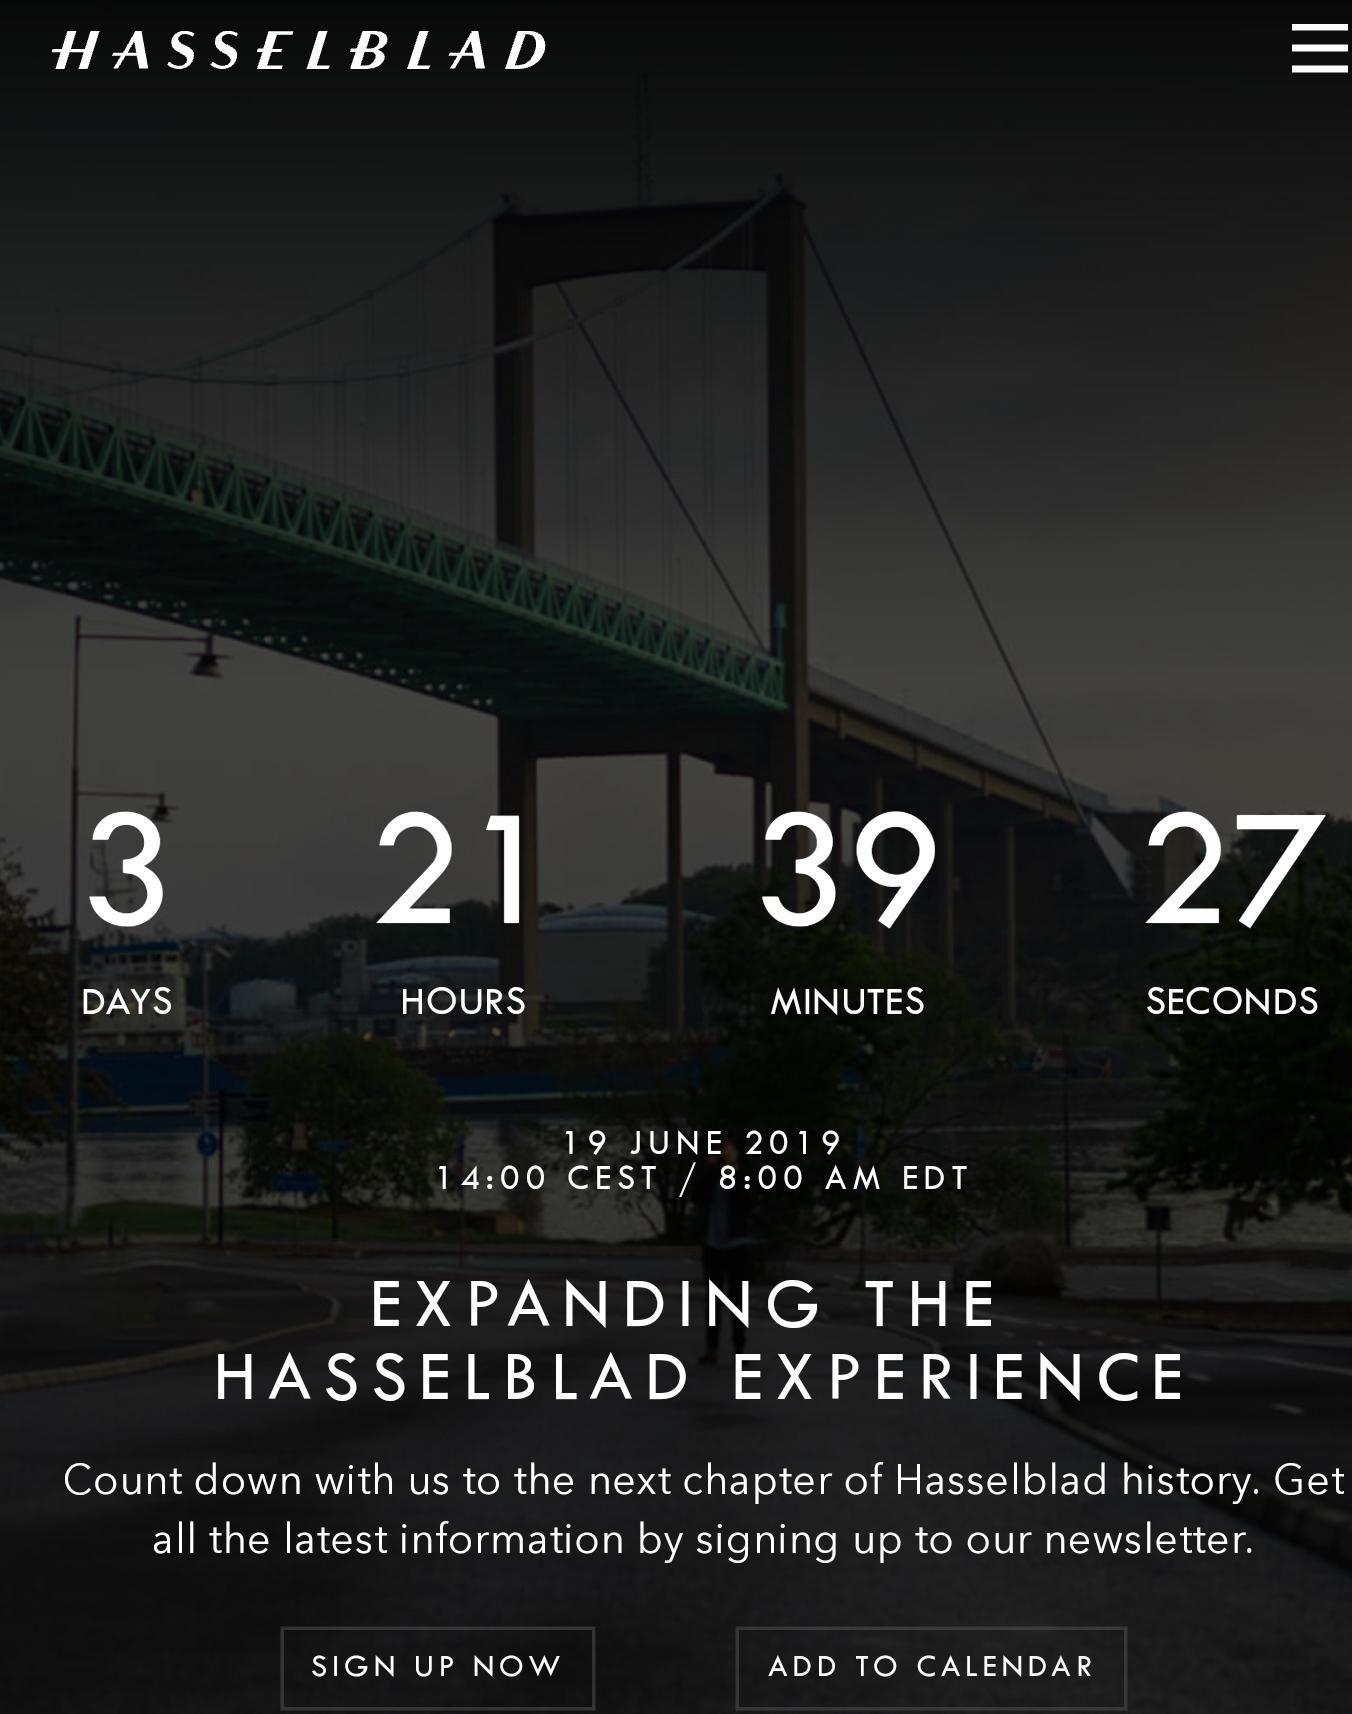 Hasselblad X2D Medium Format Camera Coming? - EOSHD - EOSHD Forum